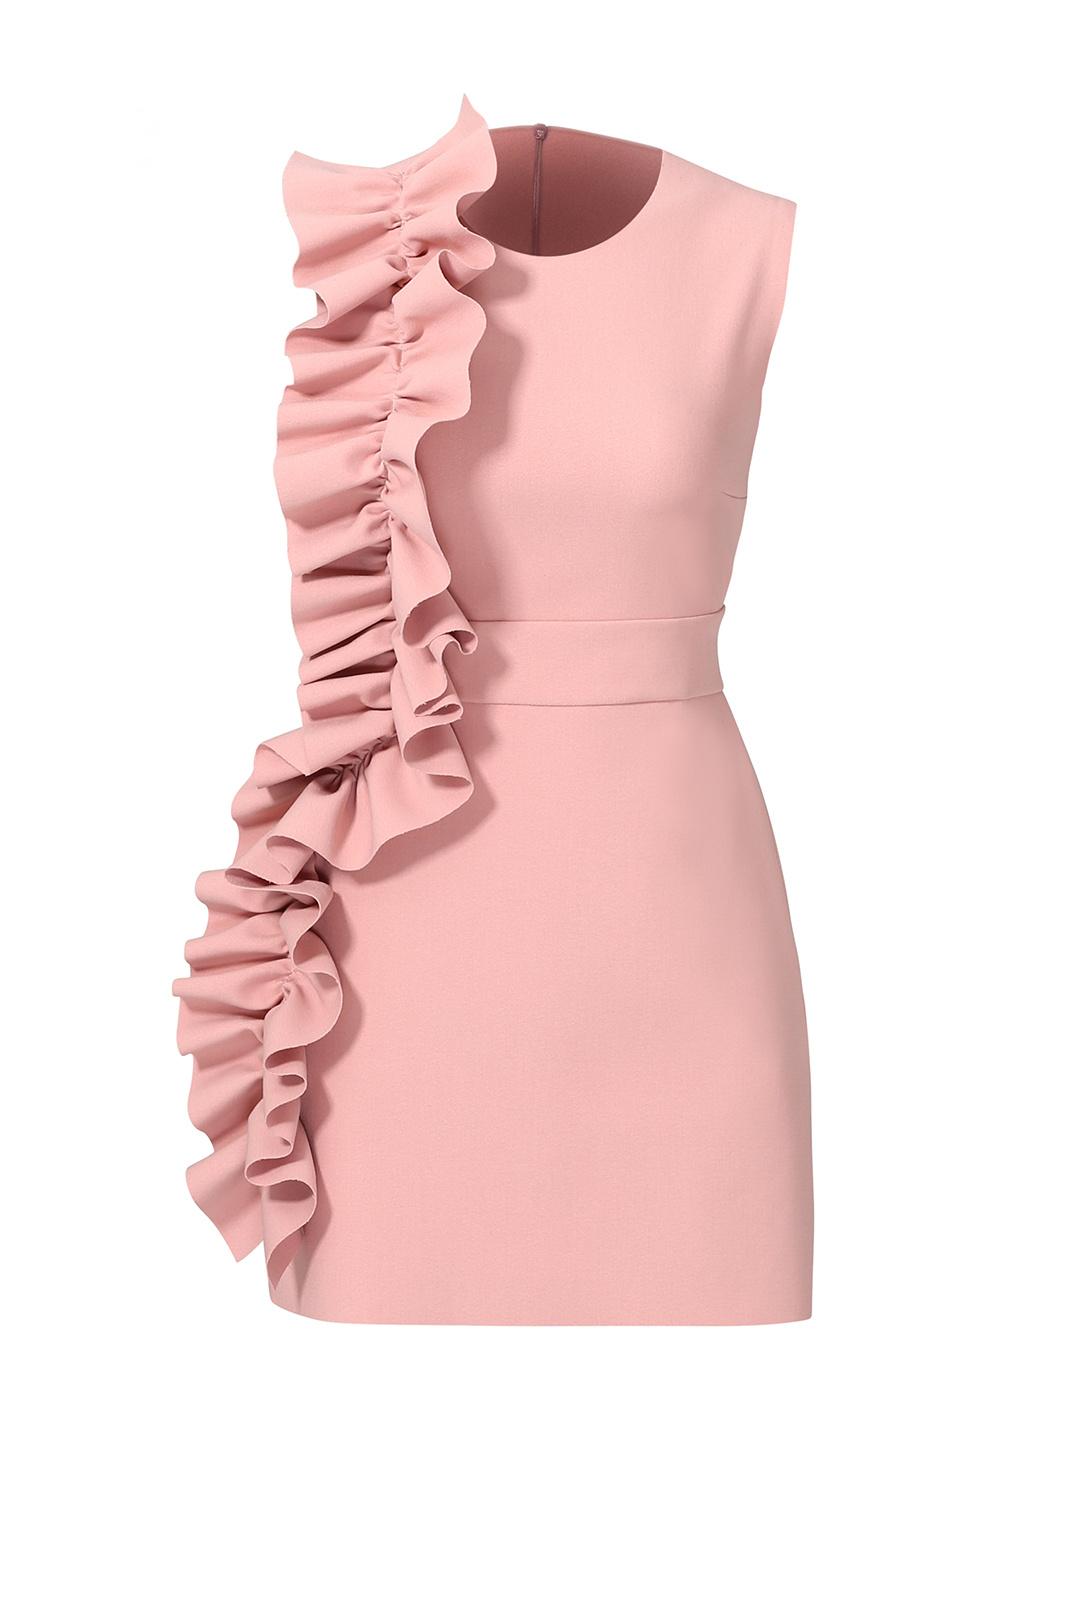 customer photos(19). pink side ruffle dress ... hfwivna